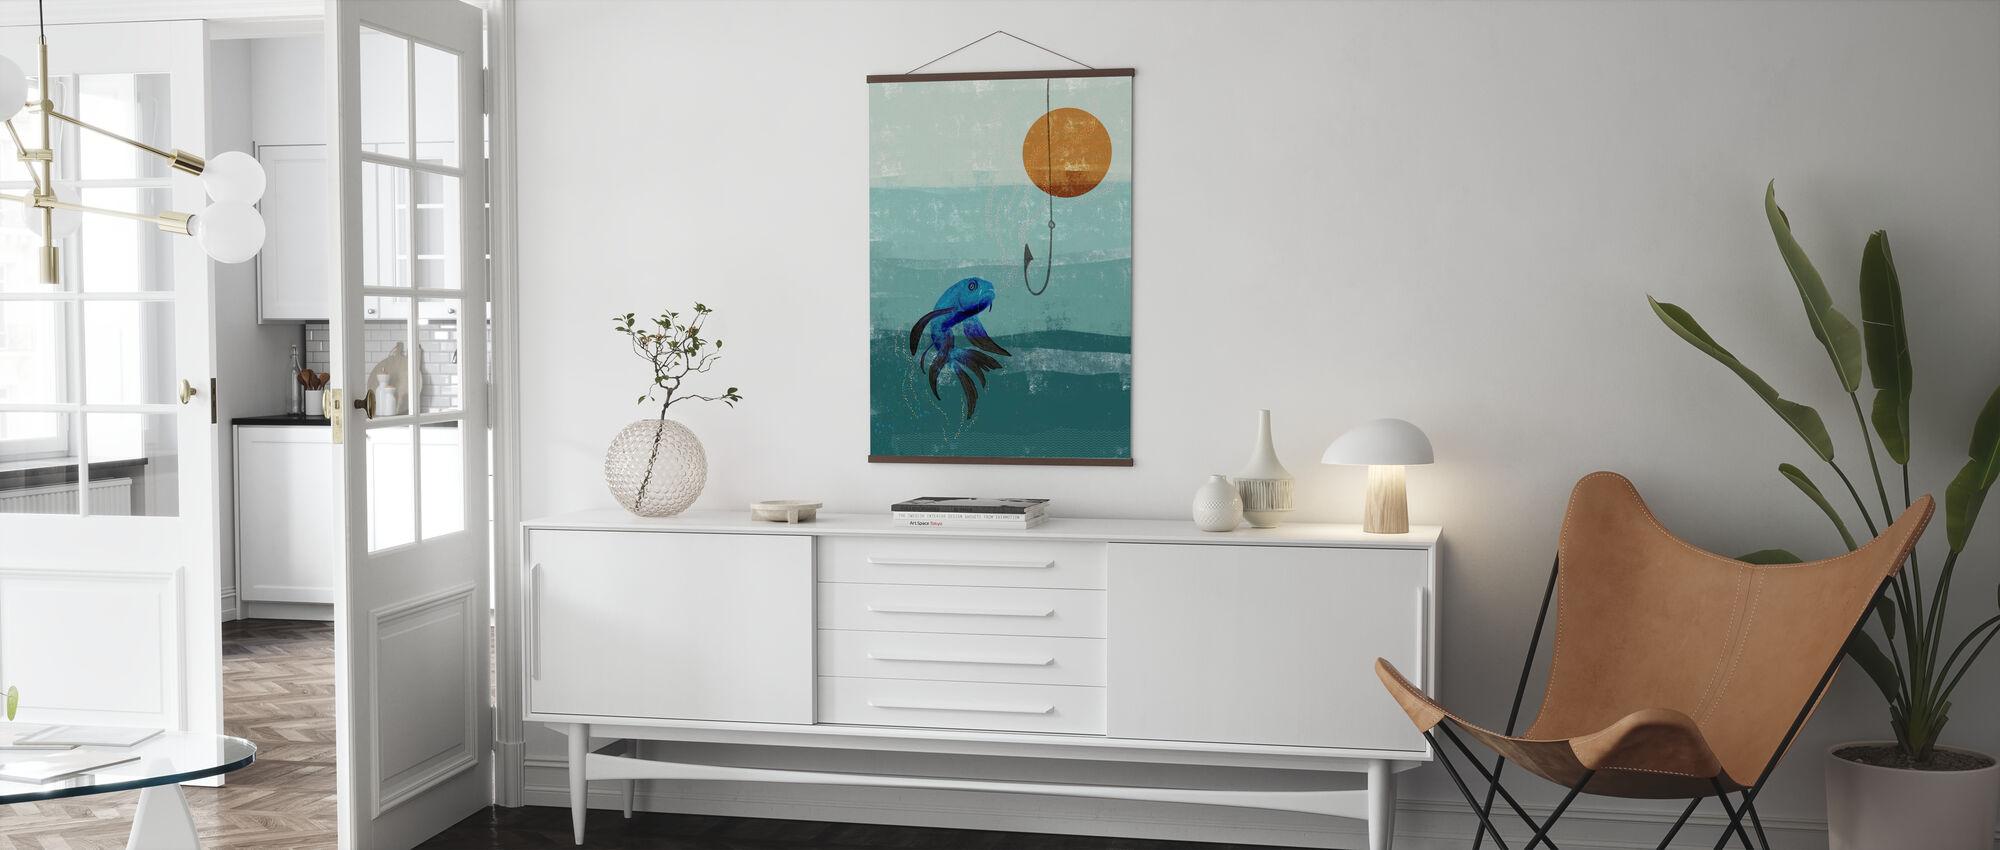 Aquarium - Poster - Wohnzimmer